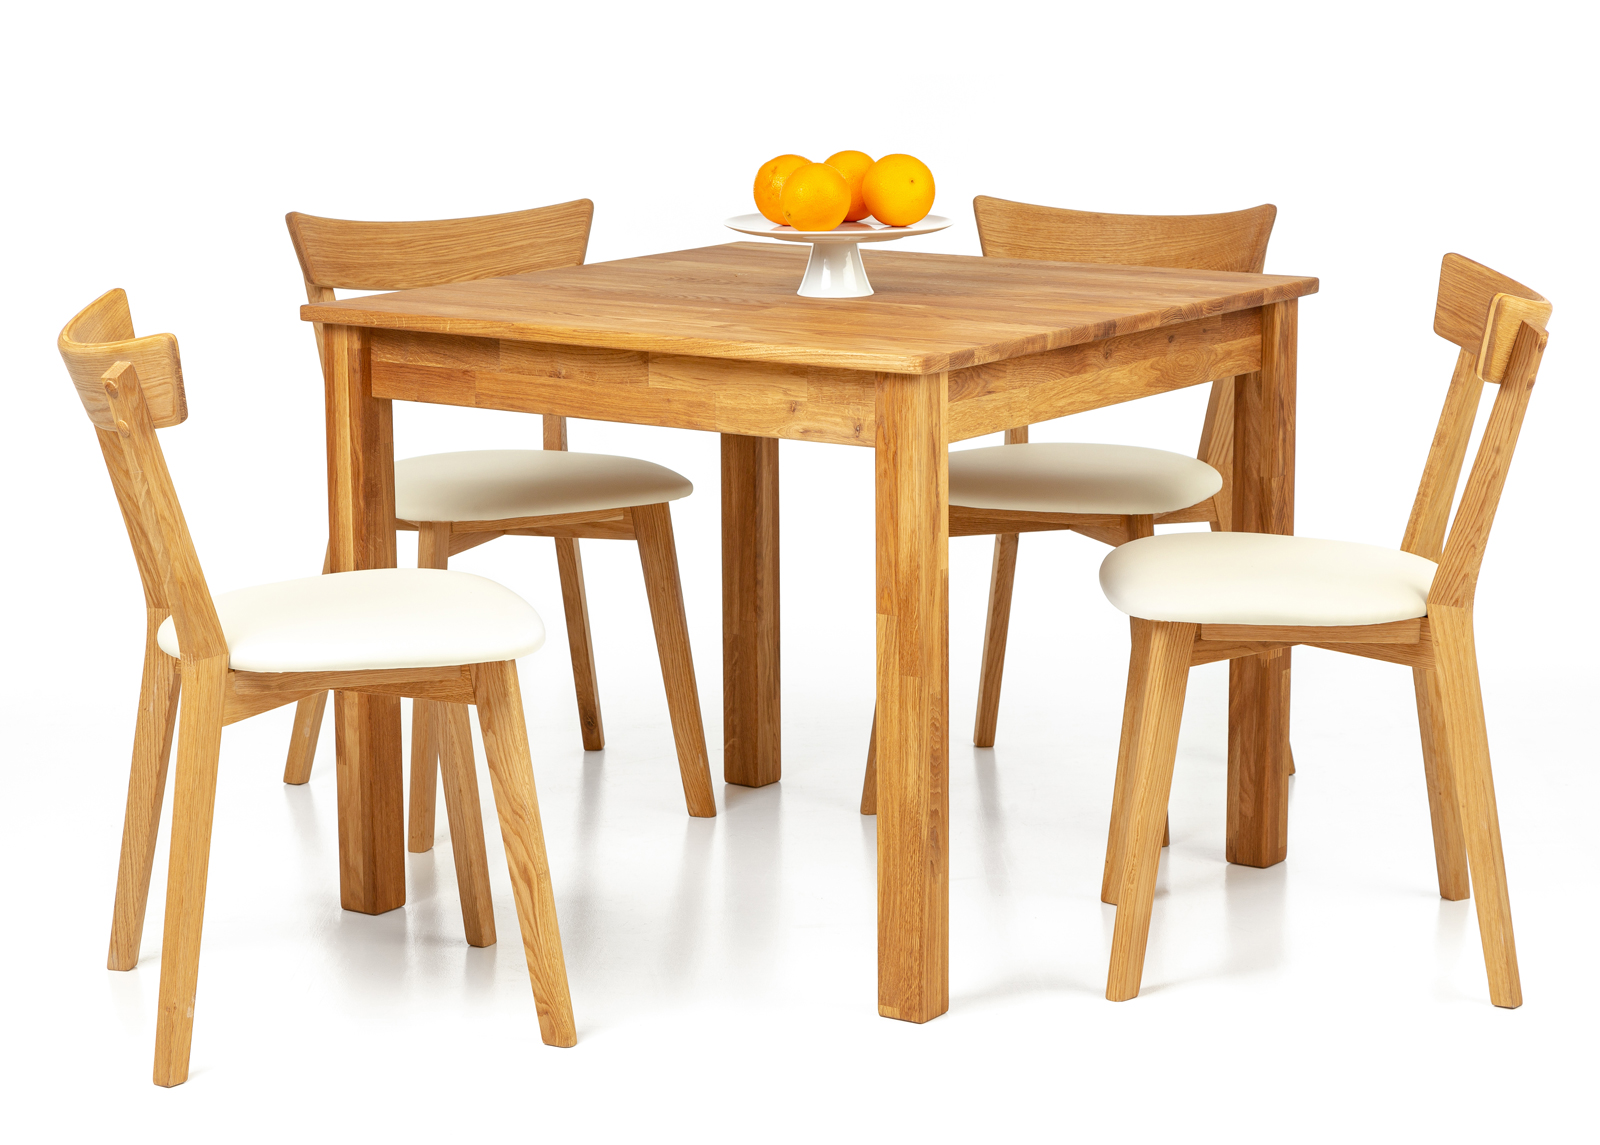 Tammi ruokapöytä Lem 90x90 cm + 2 tuolia Viola beige